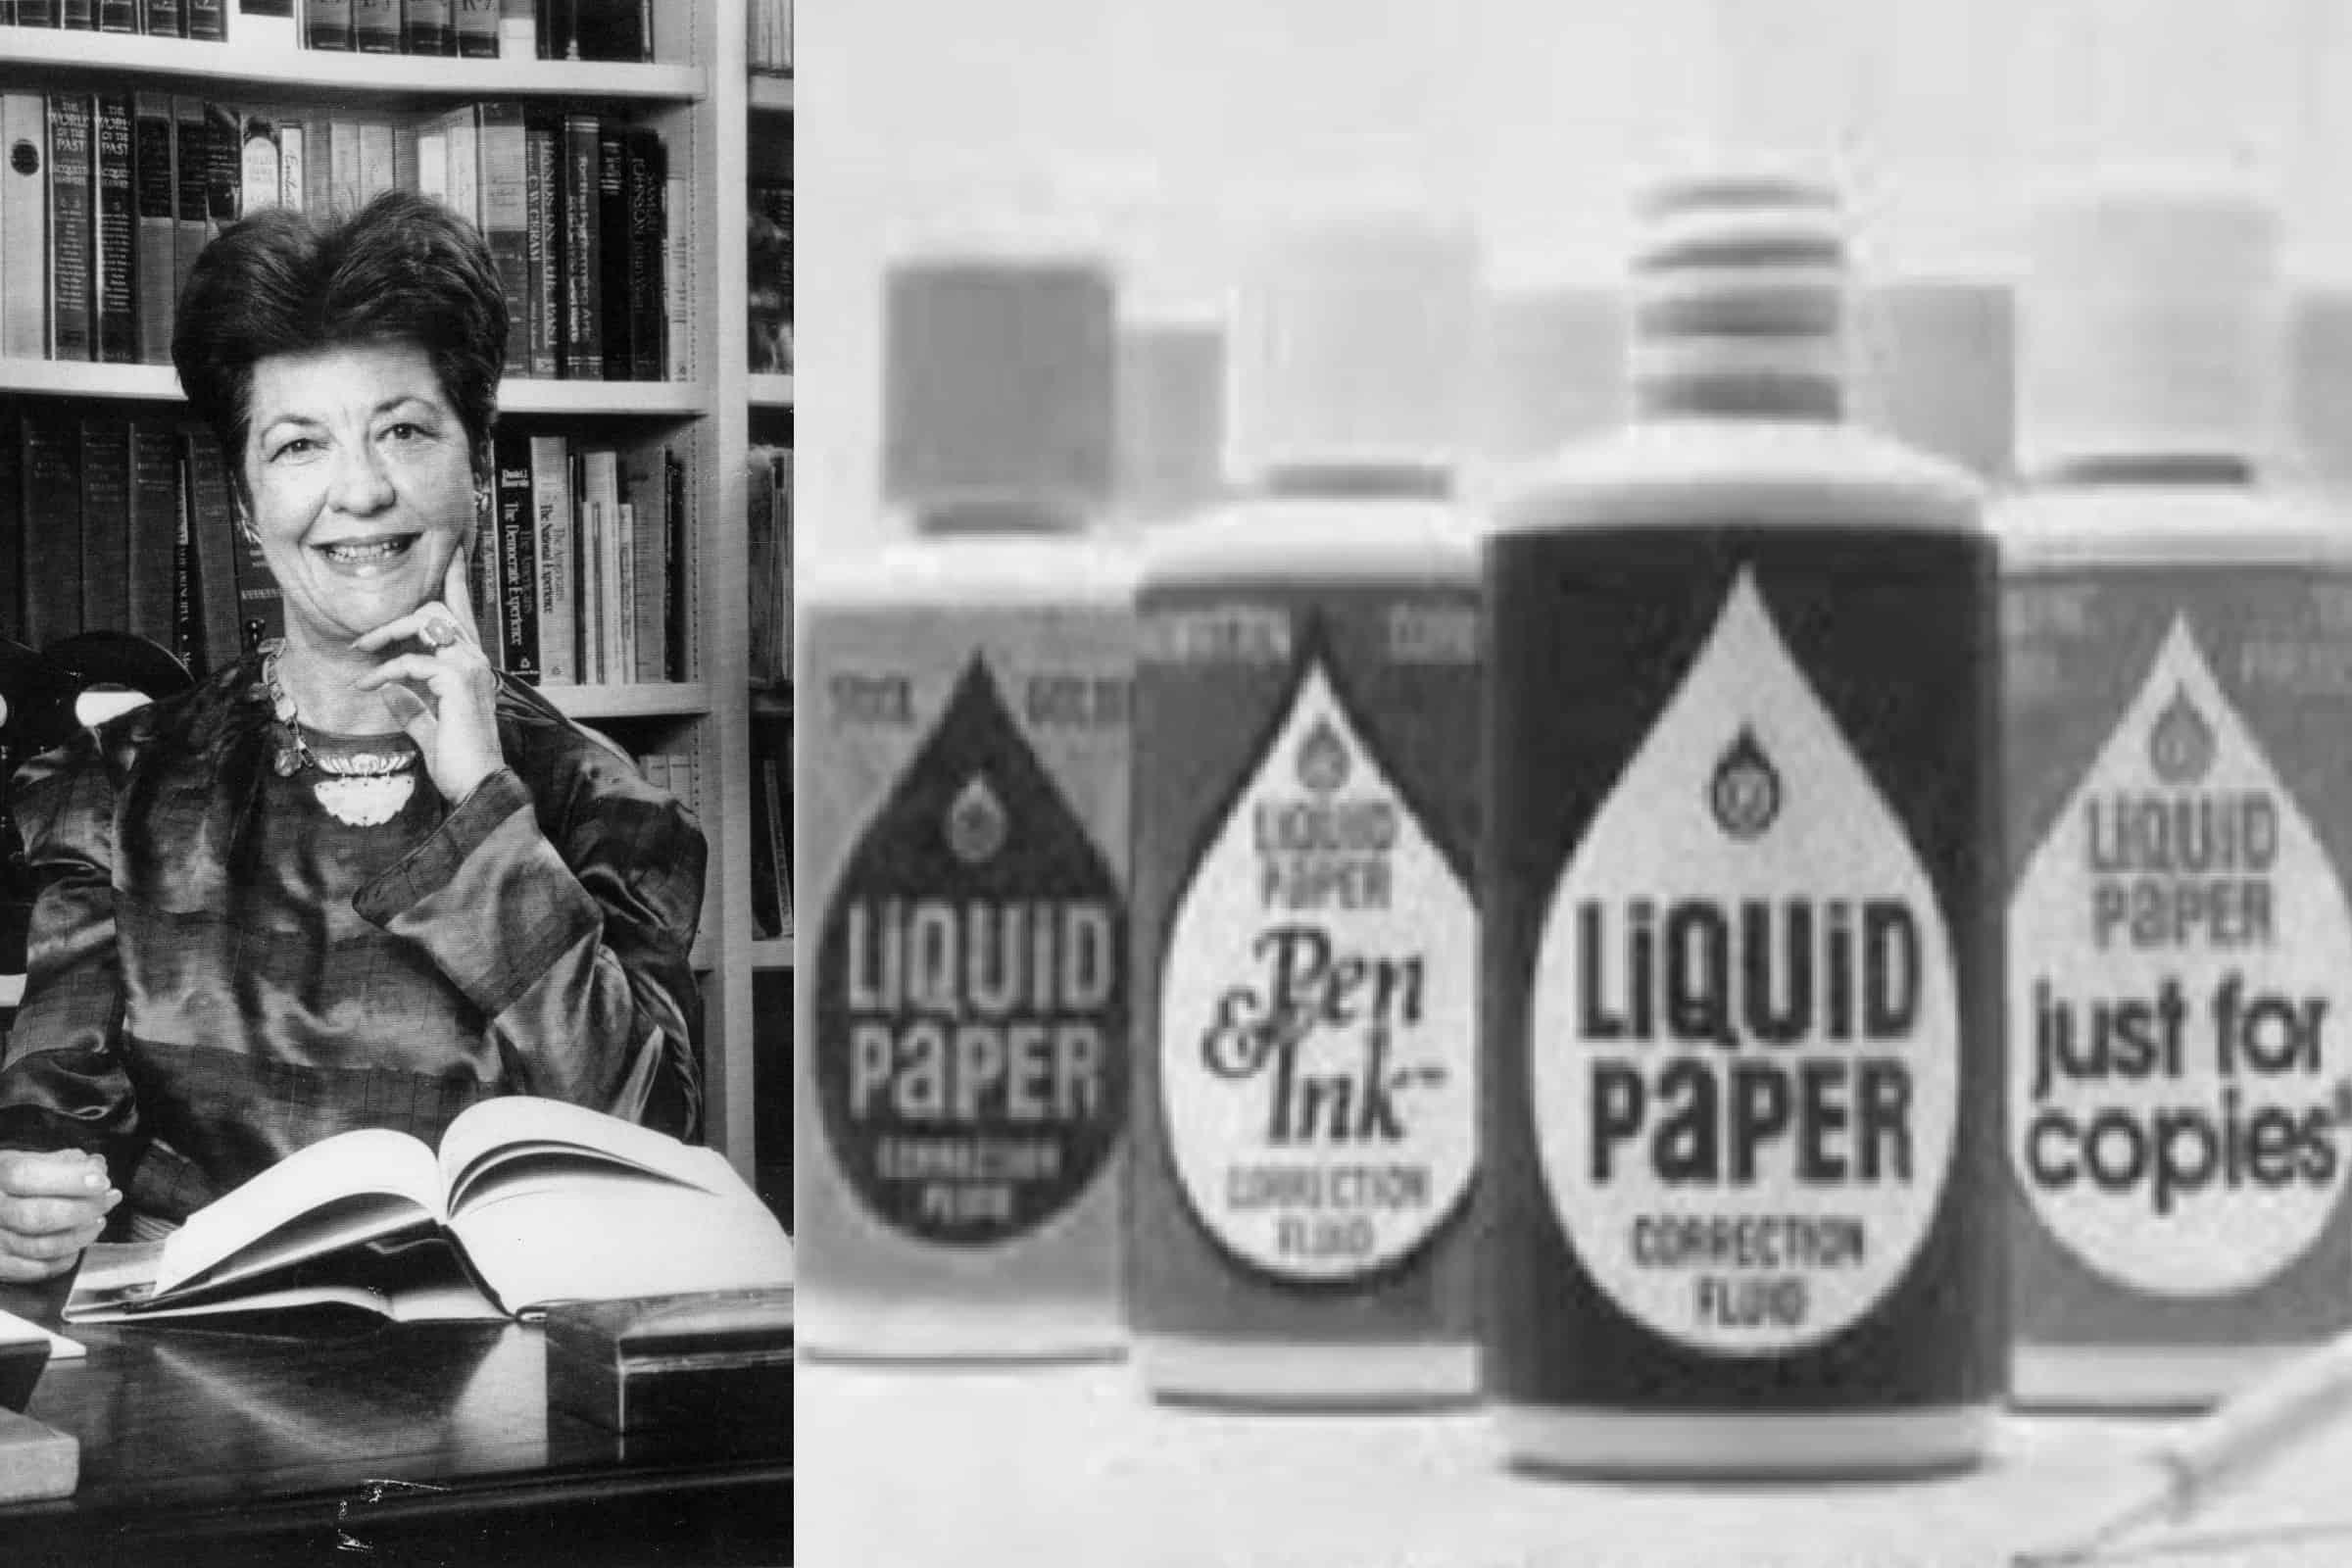 Bette Nesmith Graham First Liquid Paper | ITEX 2020